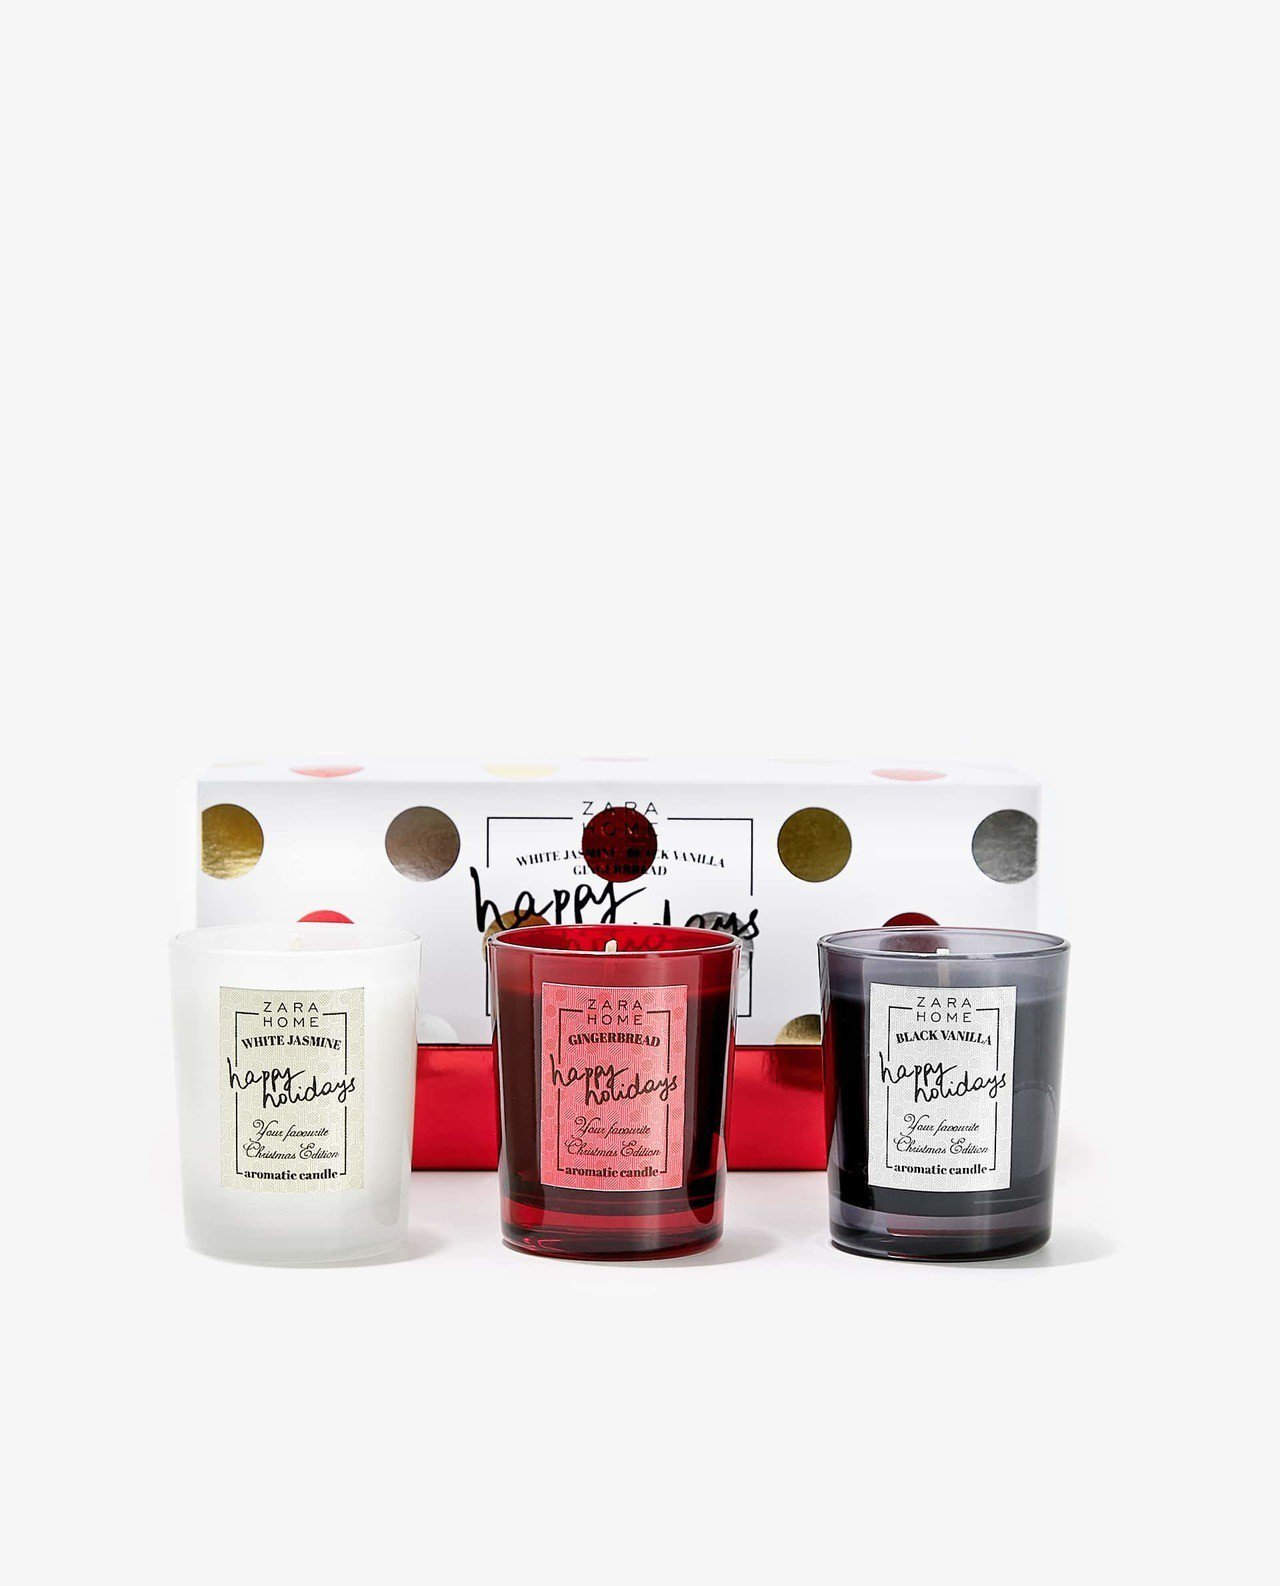 ZARA HOME今年首度推出內含3個迷你香氛蠟燭組,售價990元。圖/ZARA...